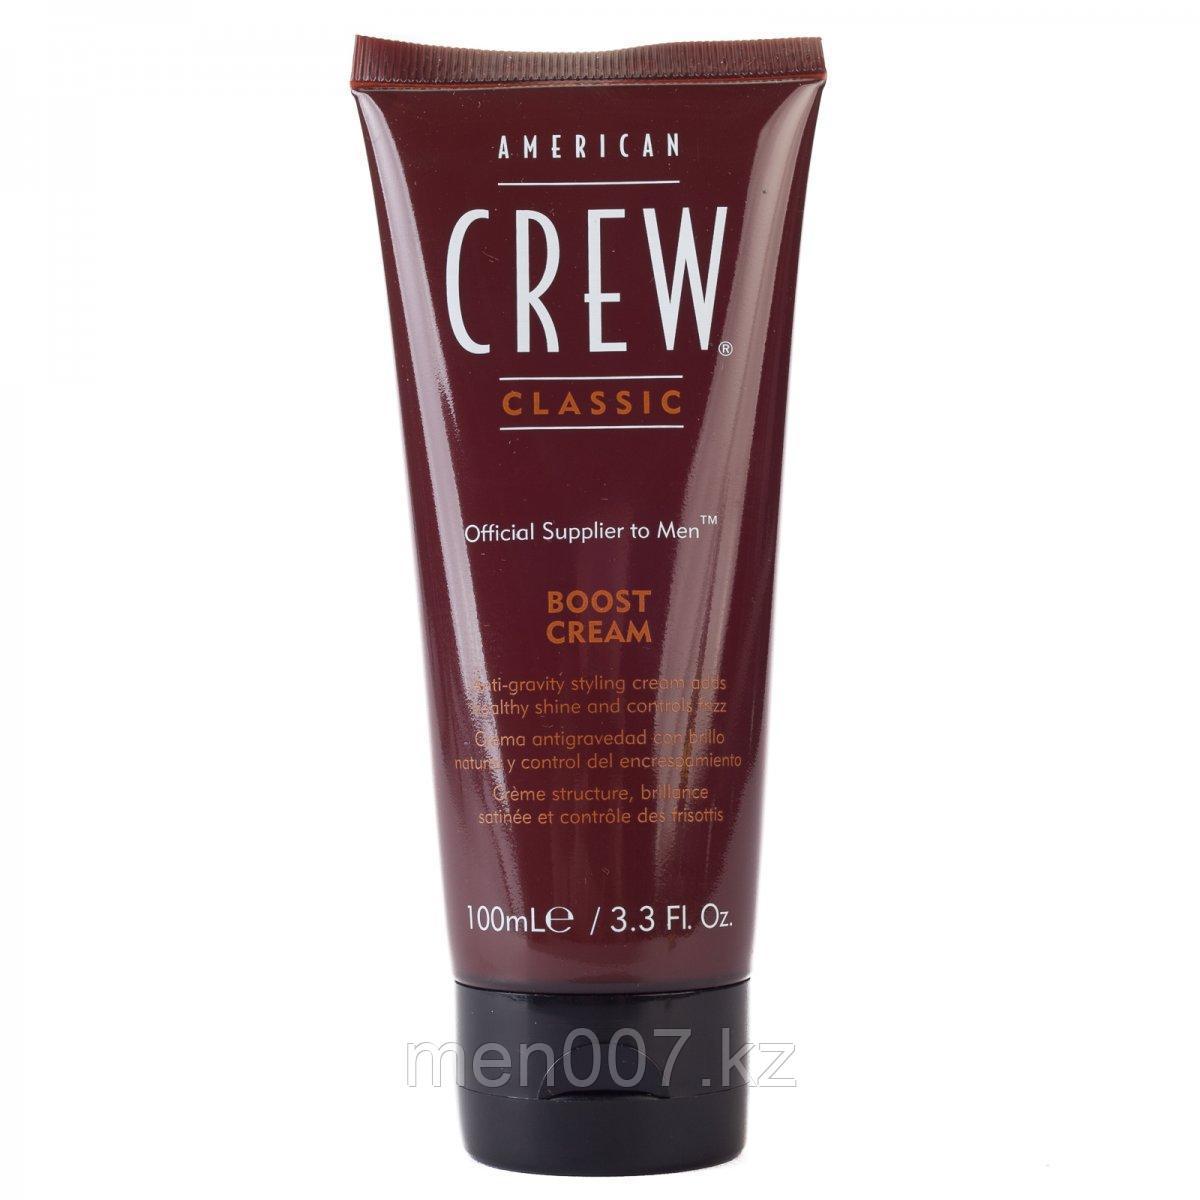 American Crew AC Classic Boost Cream (Уплотняющий крем для придания объема) 100 мл